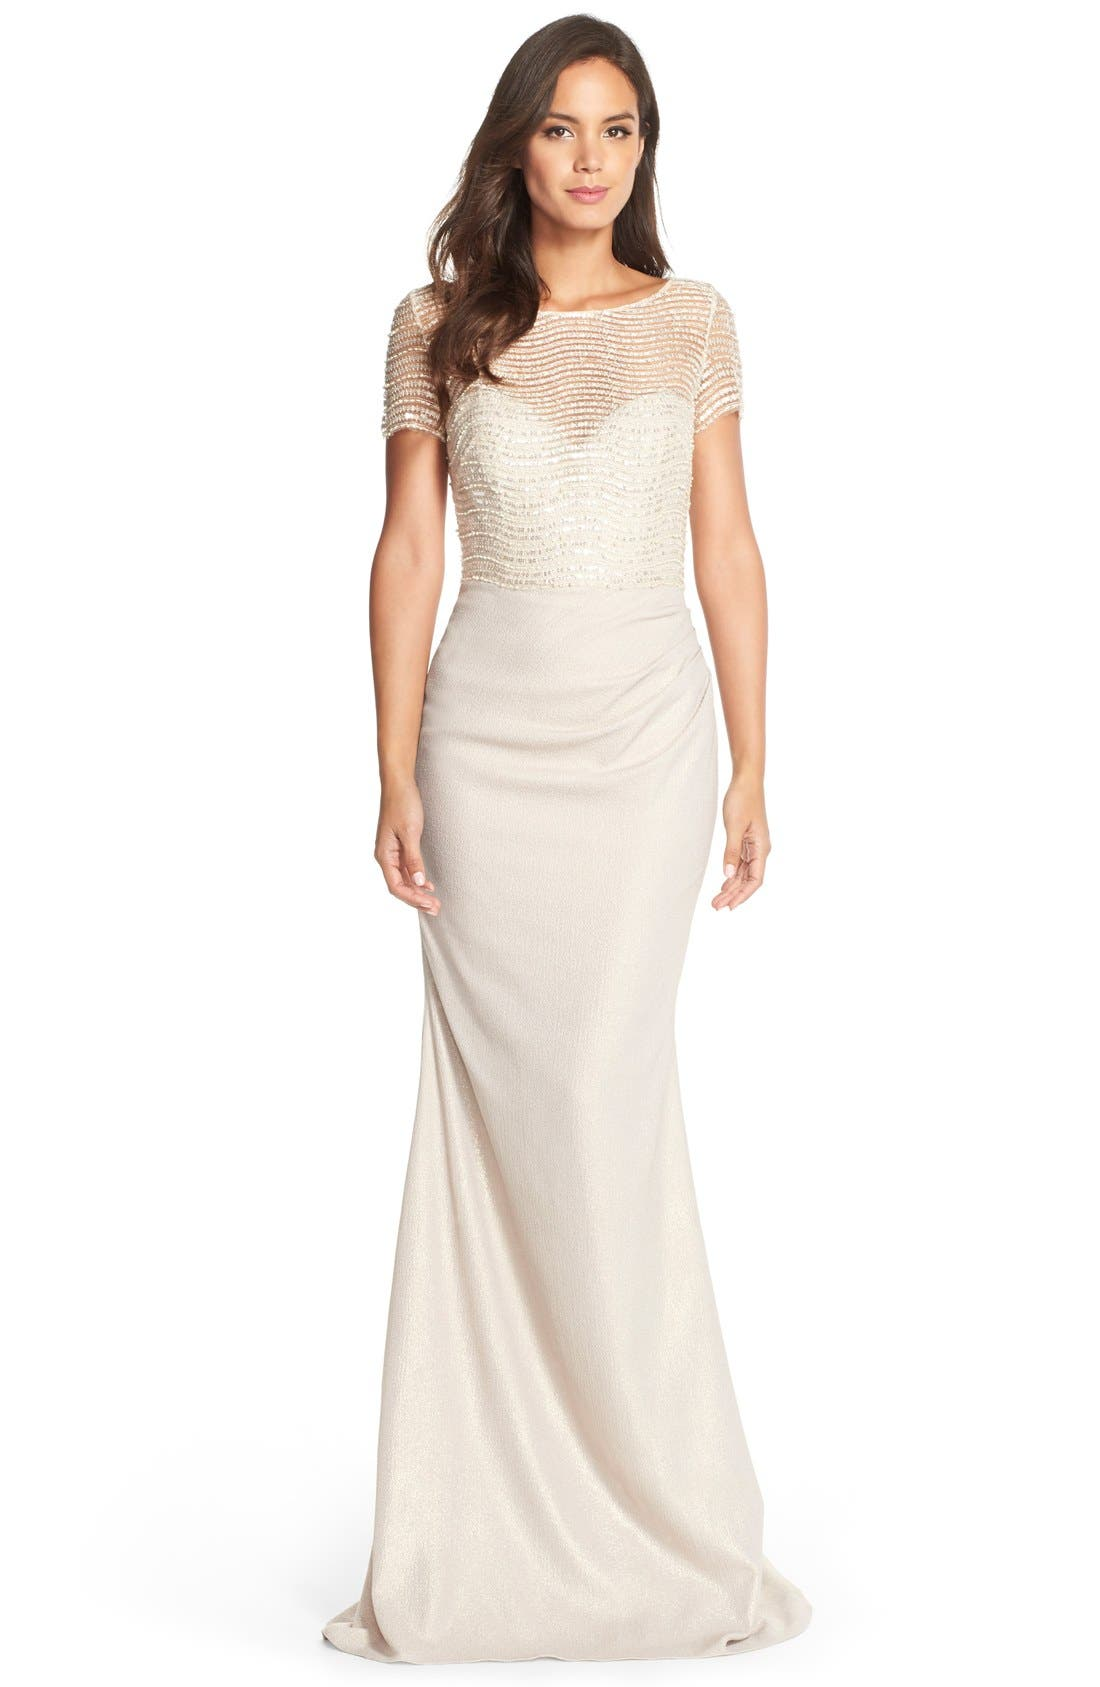 Alternate Image 1 Selected - Badgley Mischka Embellished Illusion Crepe Gown